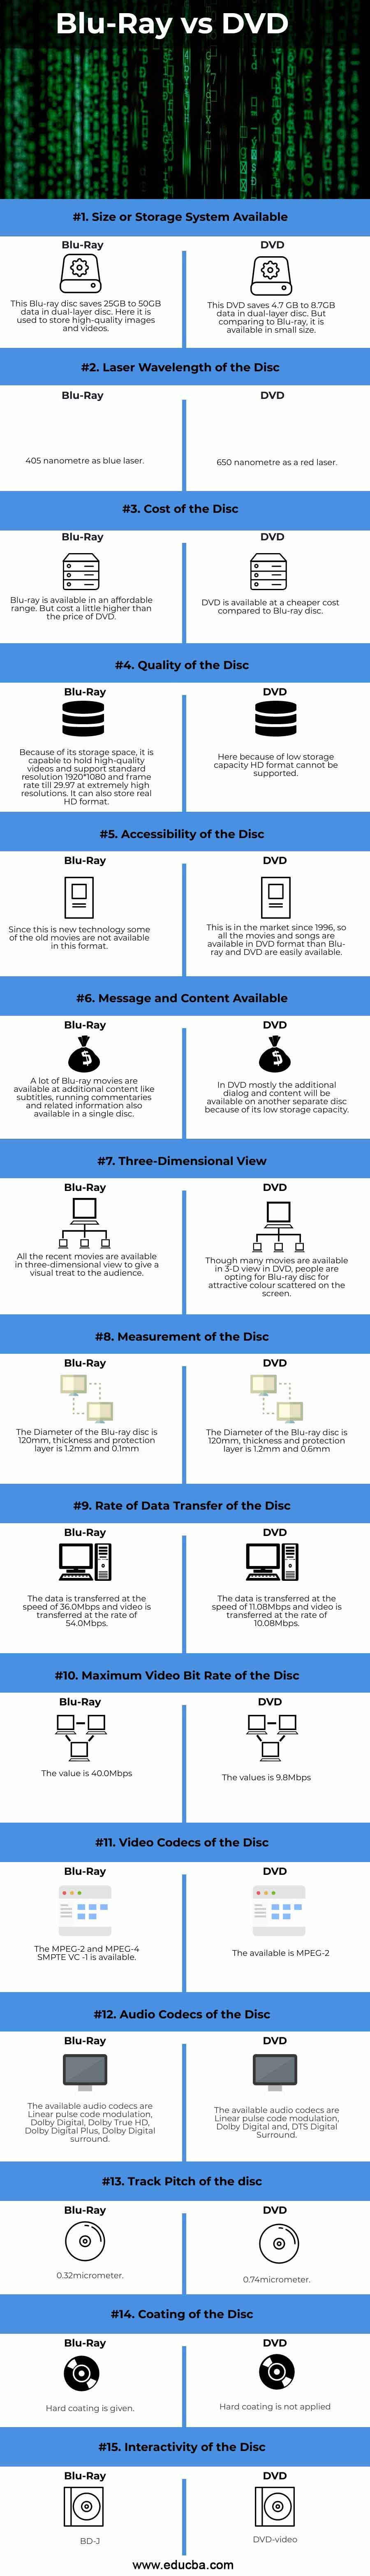 Blu-Ray-vs-DVD-info